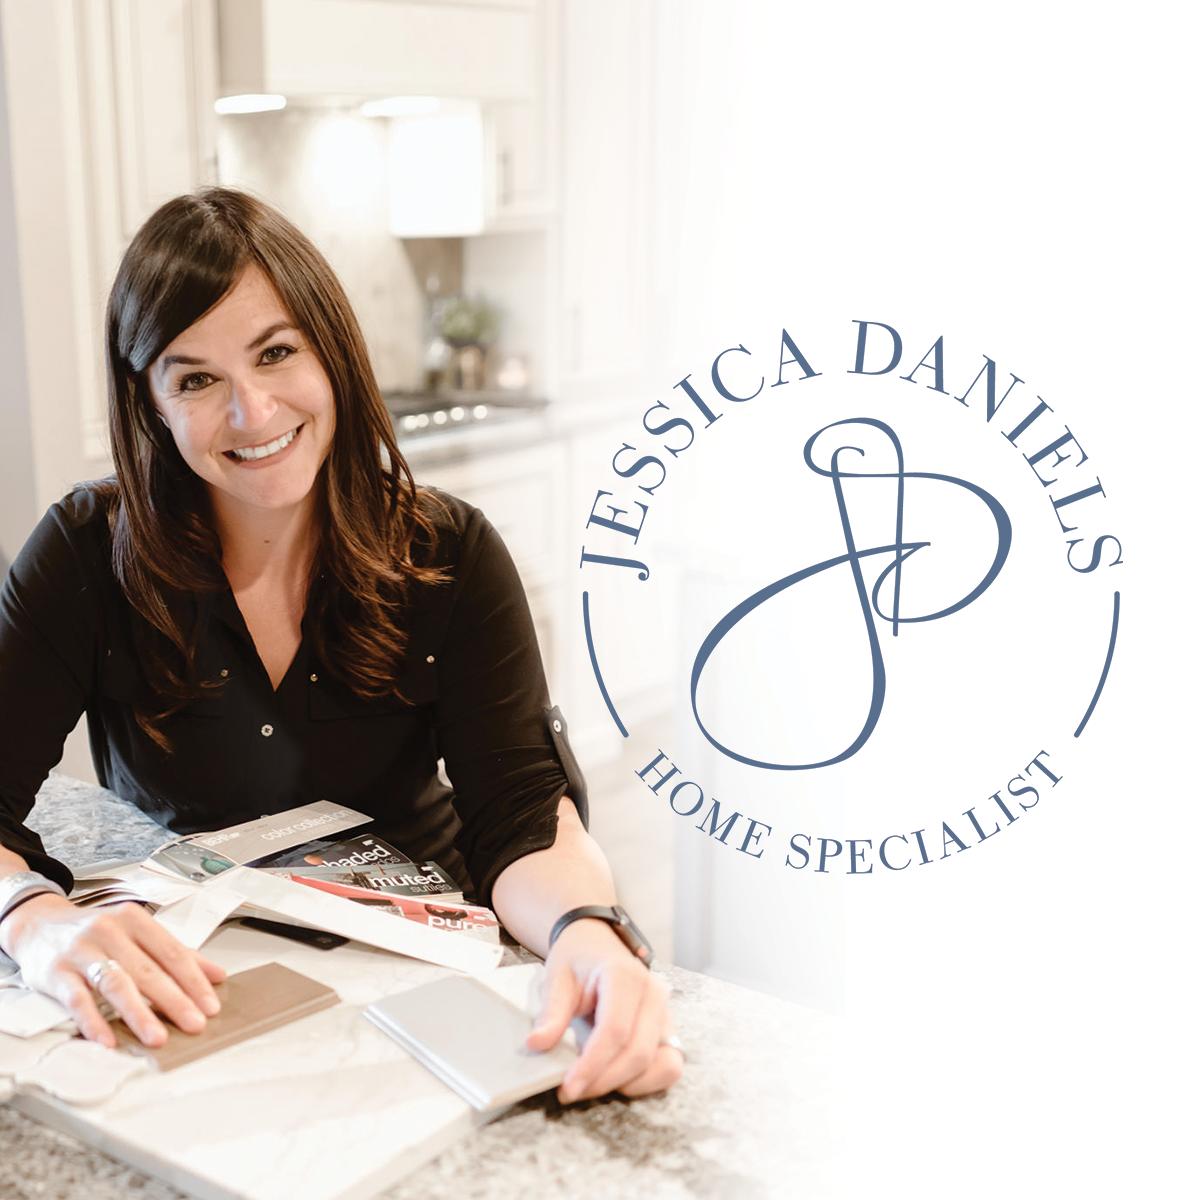 Jessica Daniels Brand